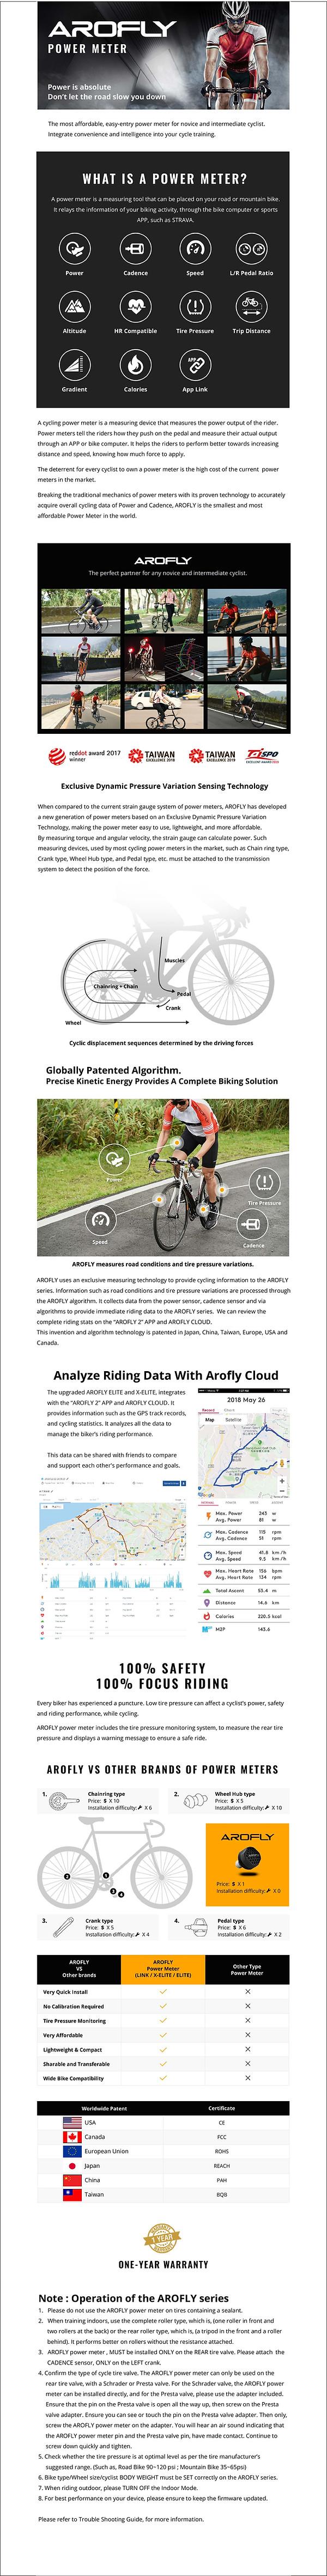 AROFLY-20190828-1.jpg